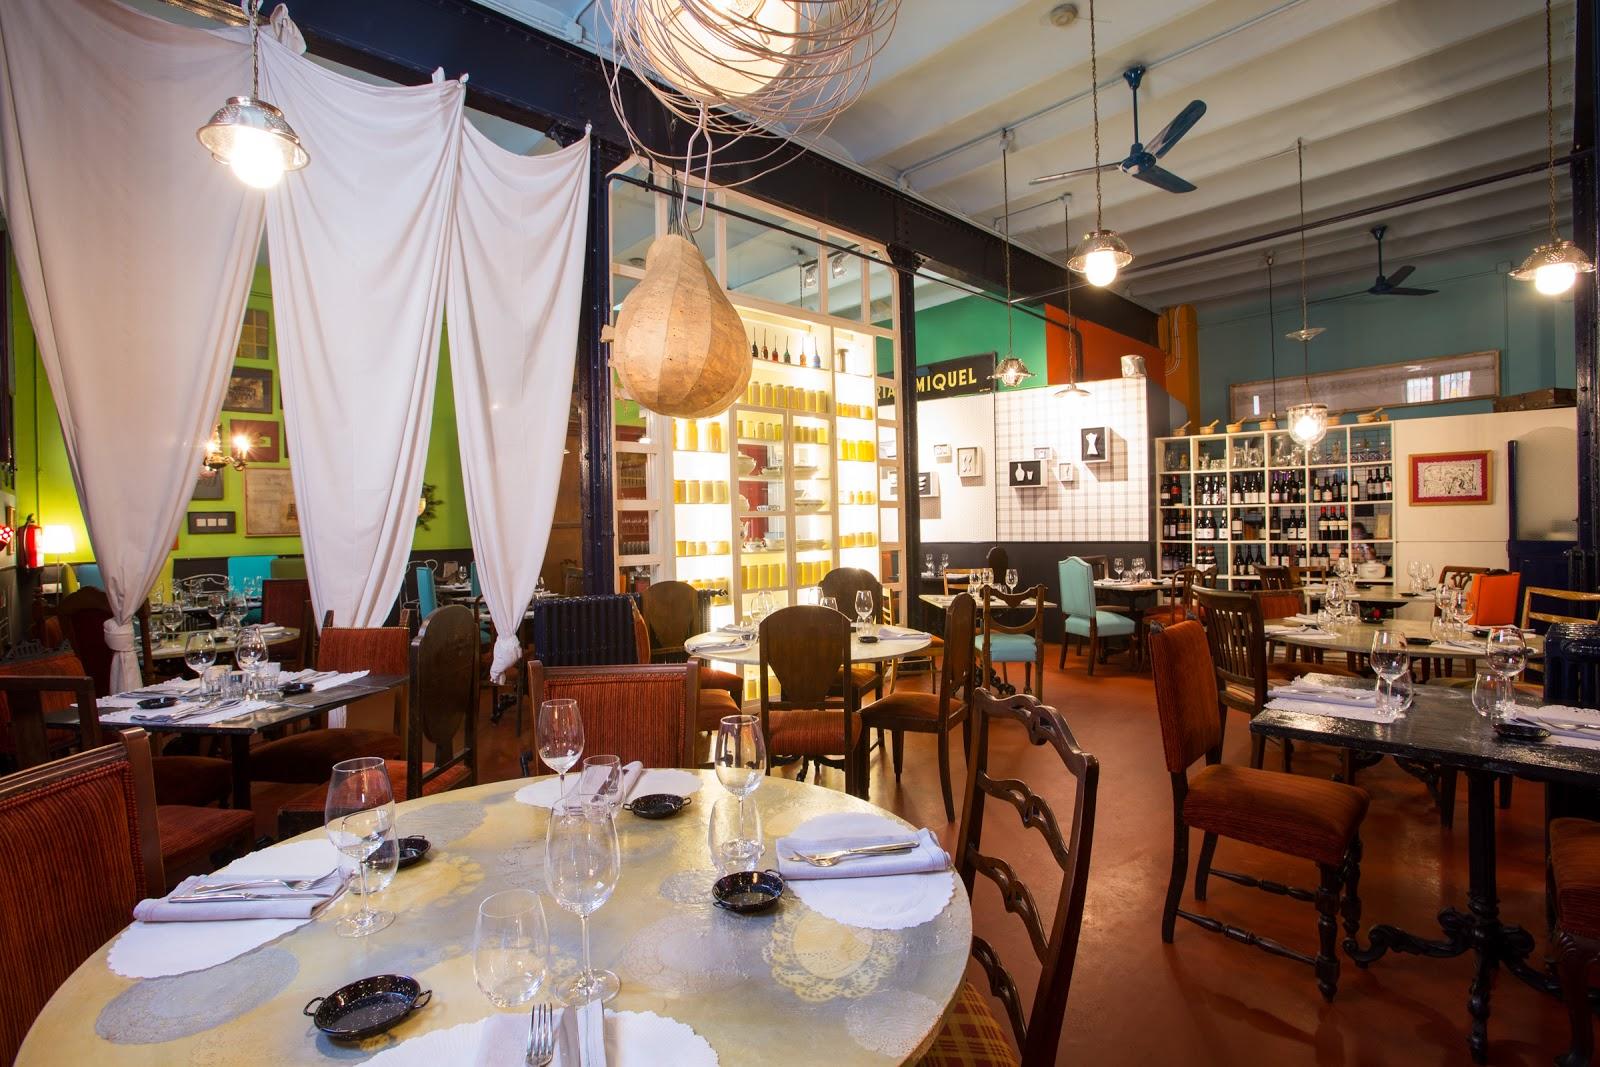 Semproniana Informaci N Til Y Fotos ~ Restaurant Semproniana Barcelona